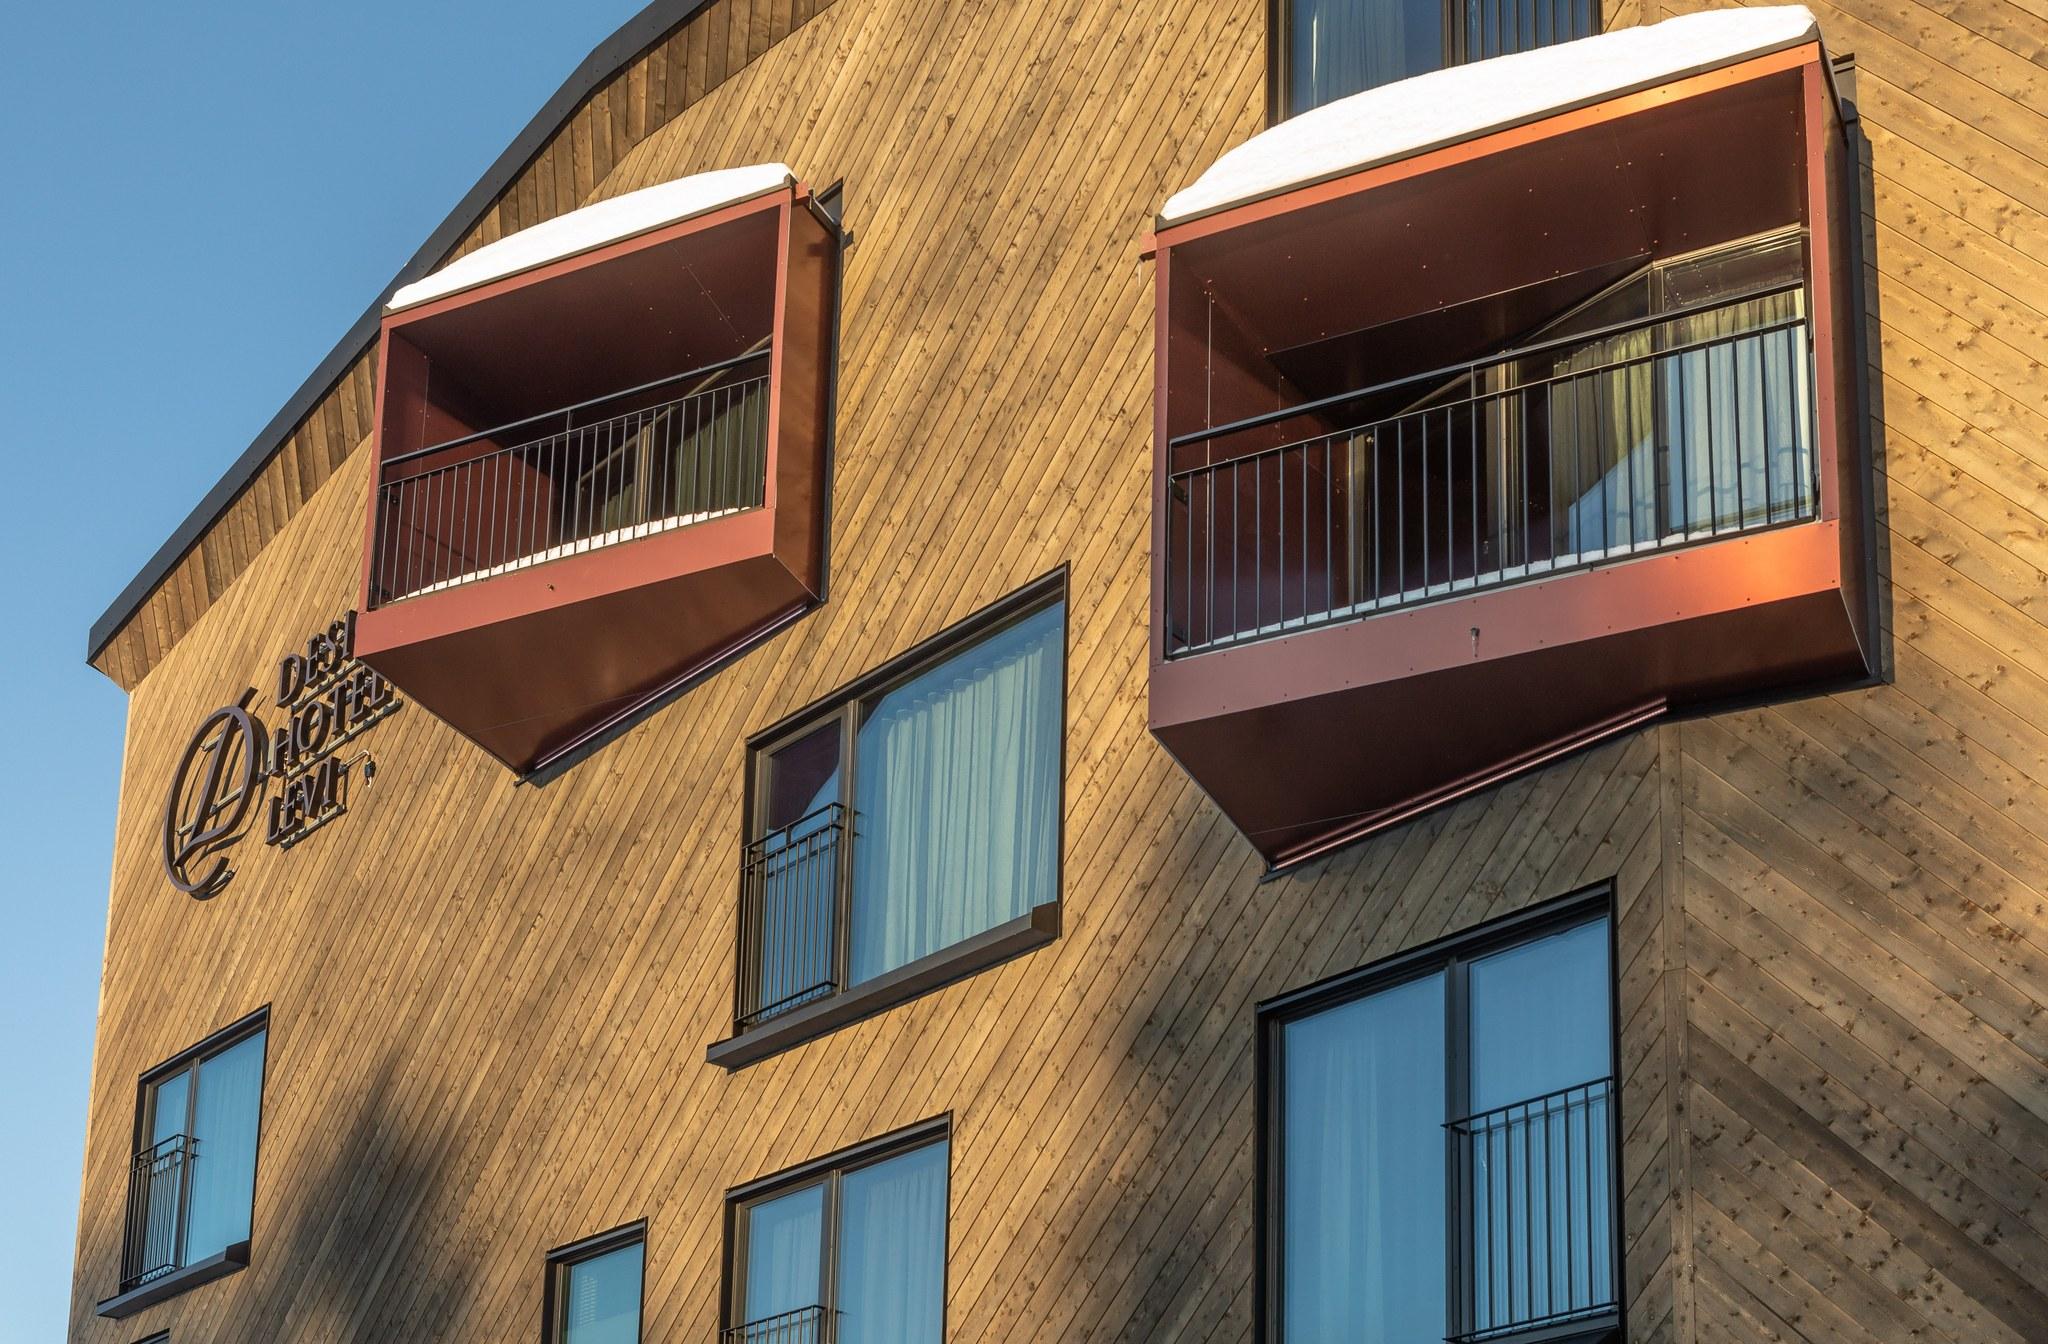 Design Hotel Levi 2 - Arno De La Chapelle